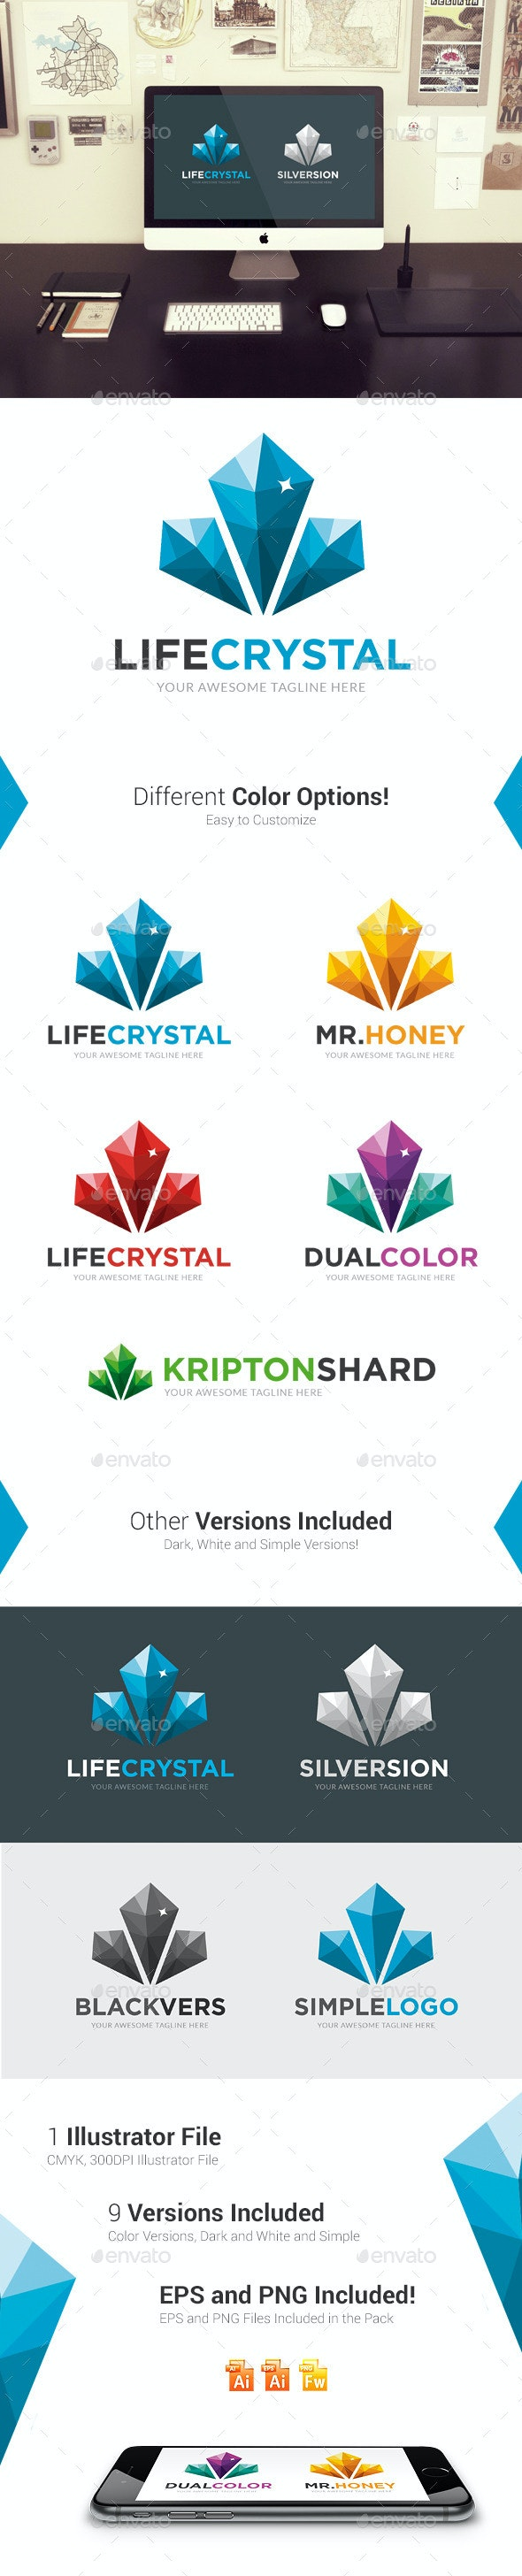 Life Crystal Logo Template - Abstract Logo Templates